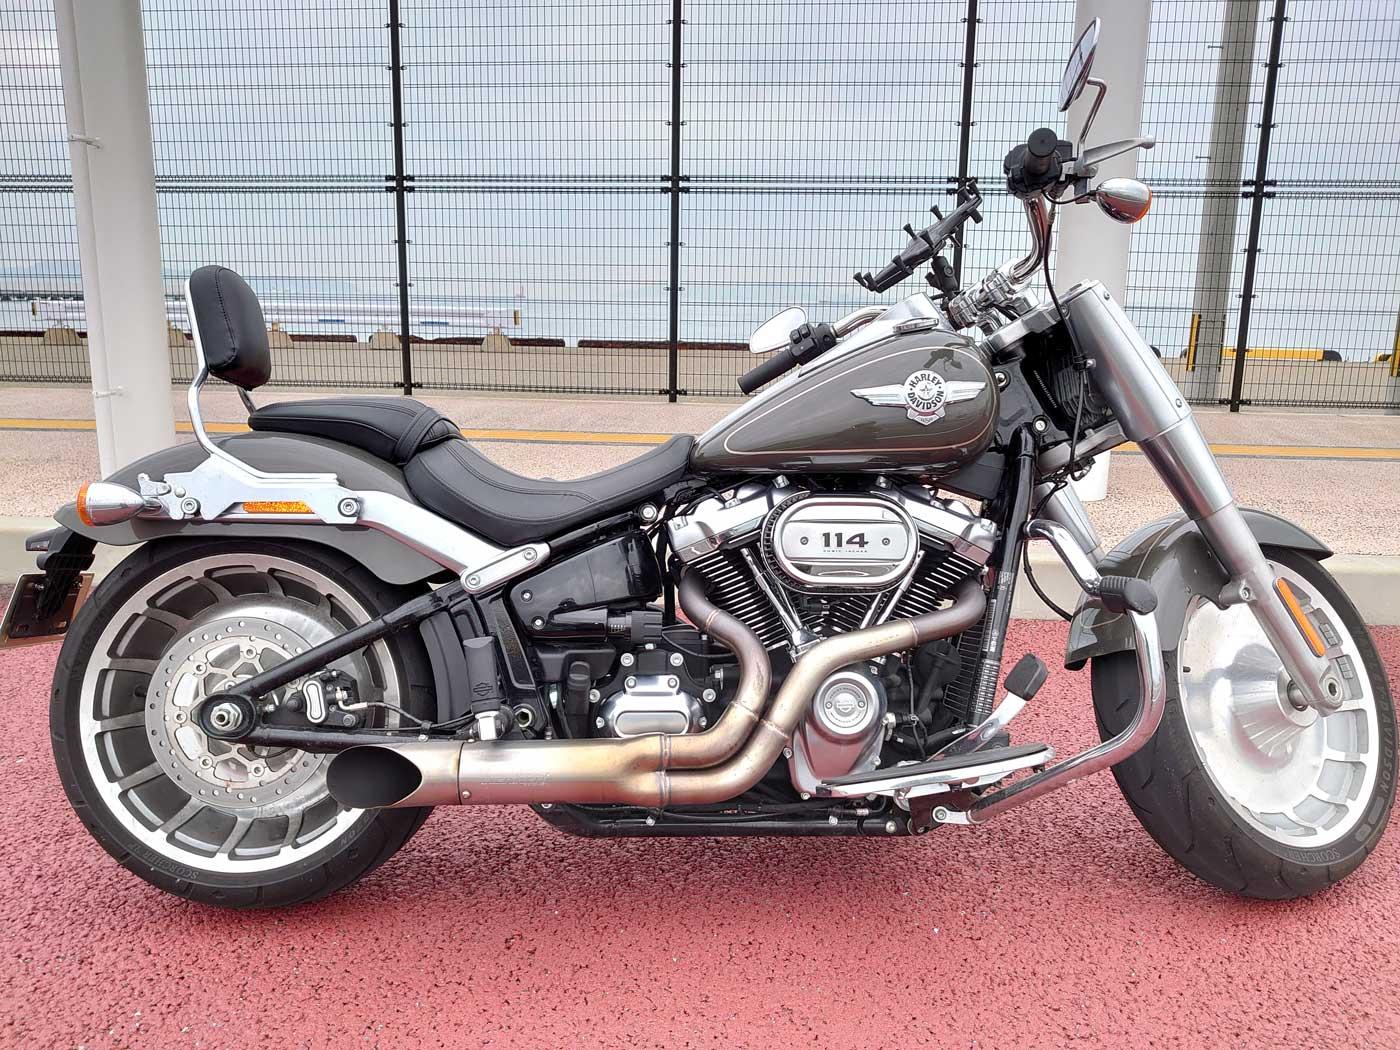 FLFBS ファットボーイ(SH-203) - 【公式】レンタルバイクのベストBike® 八幡駅前